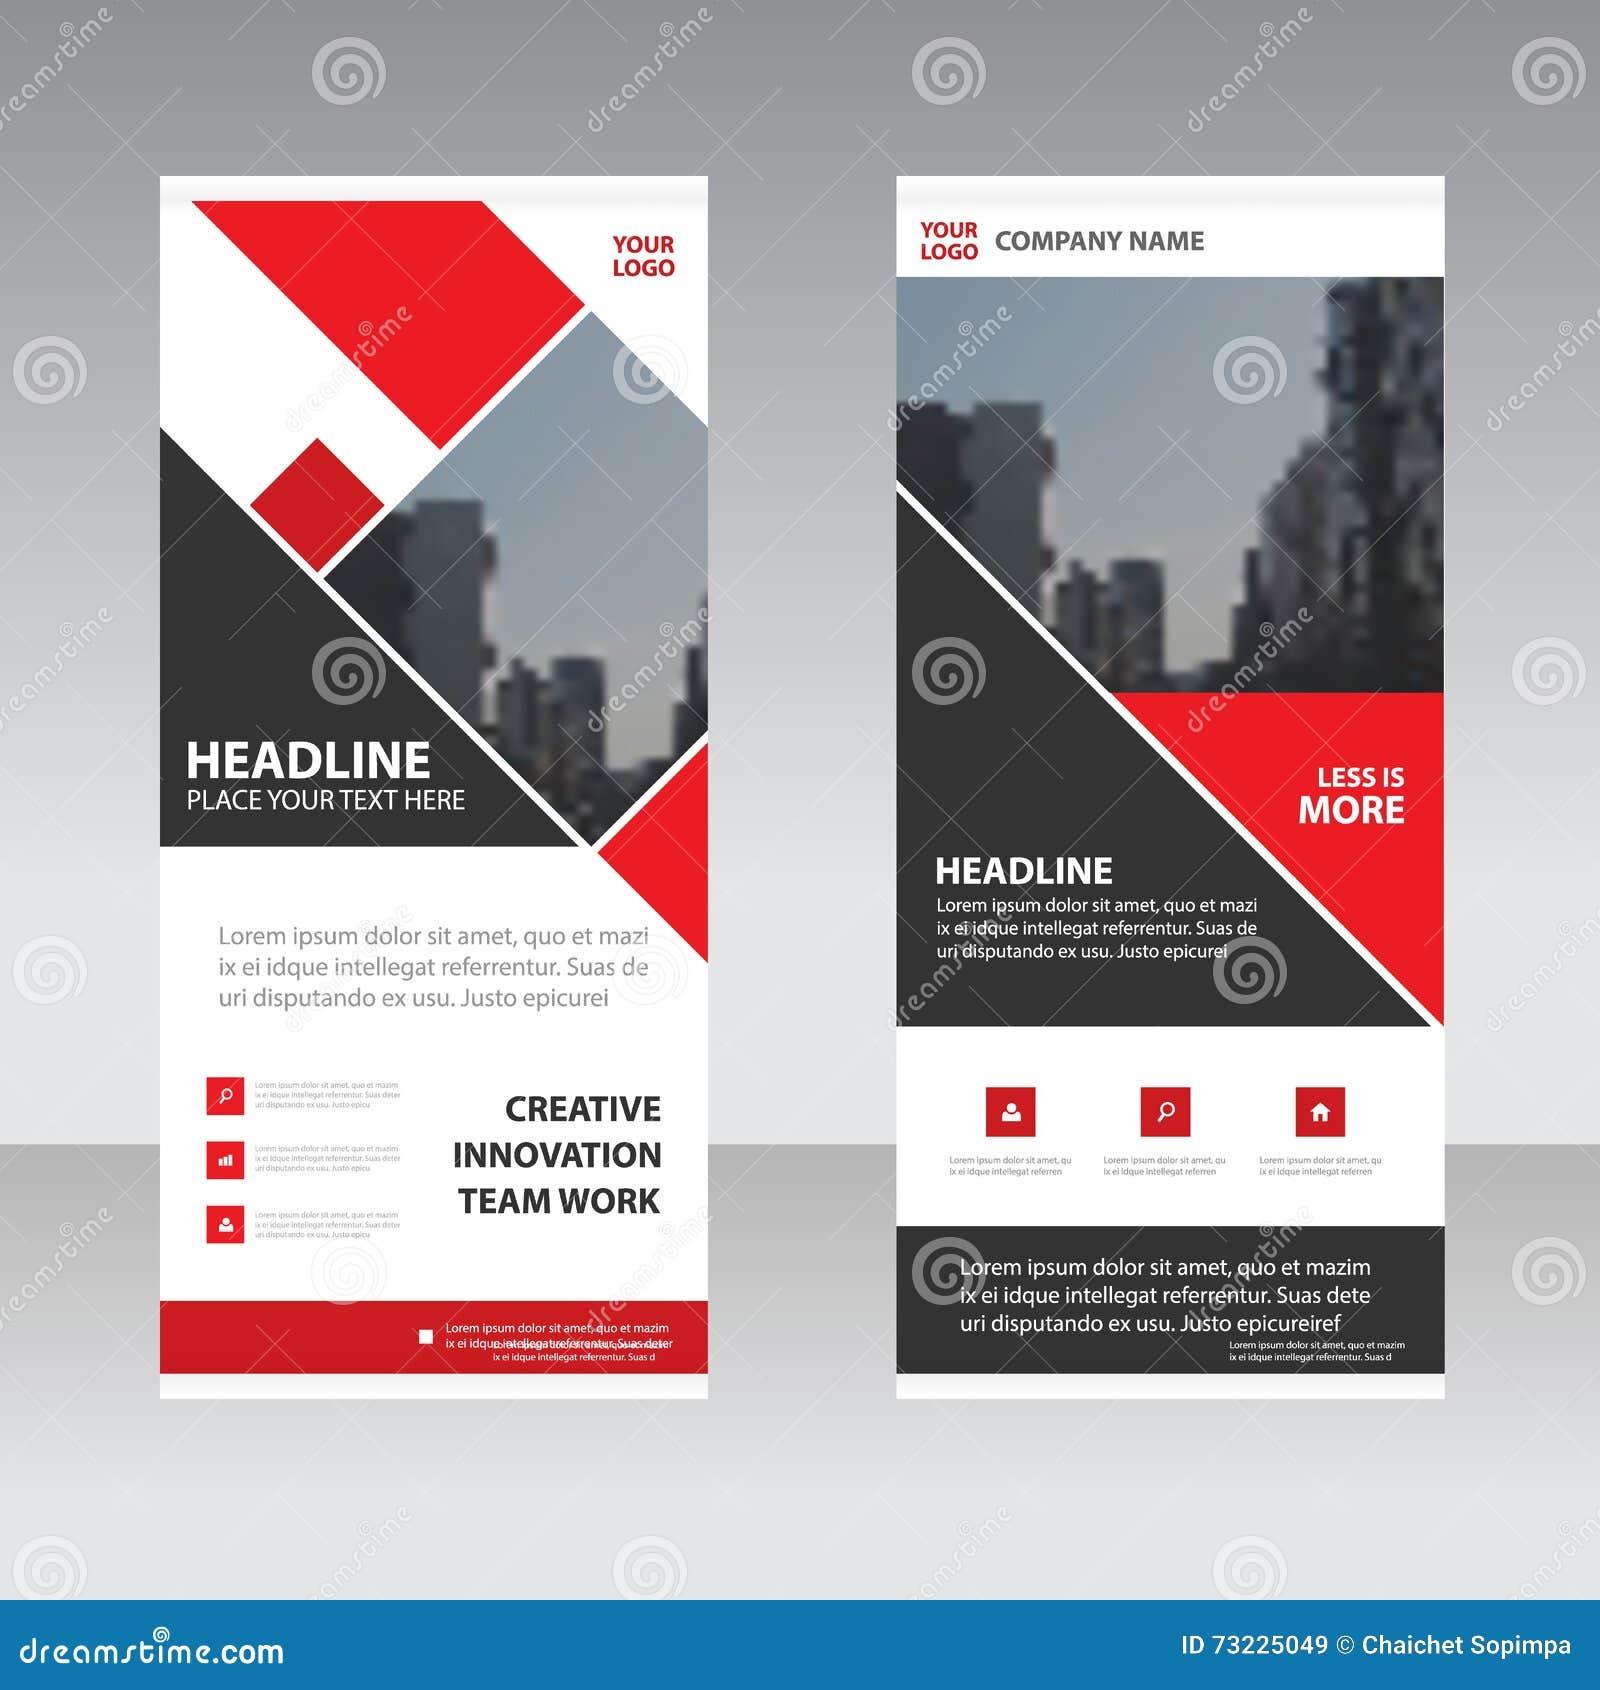 Design for roll up banner - Abstract Banner Black Business Design